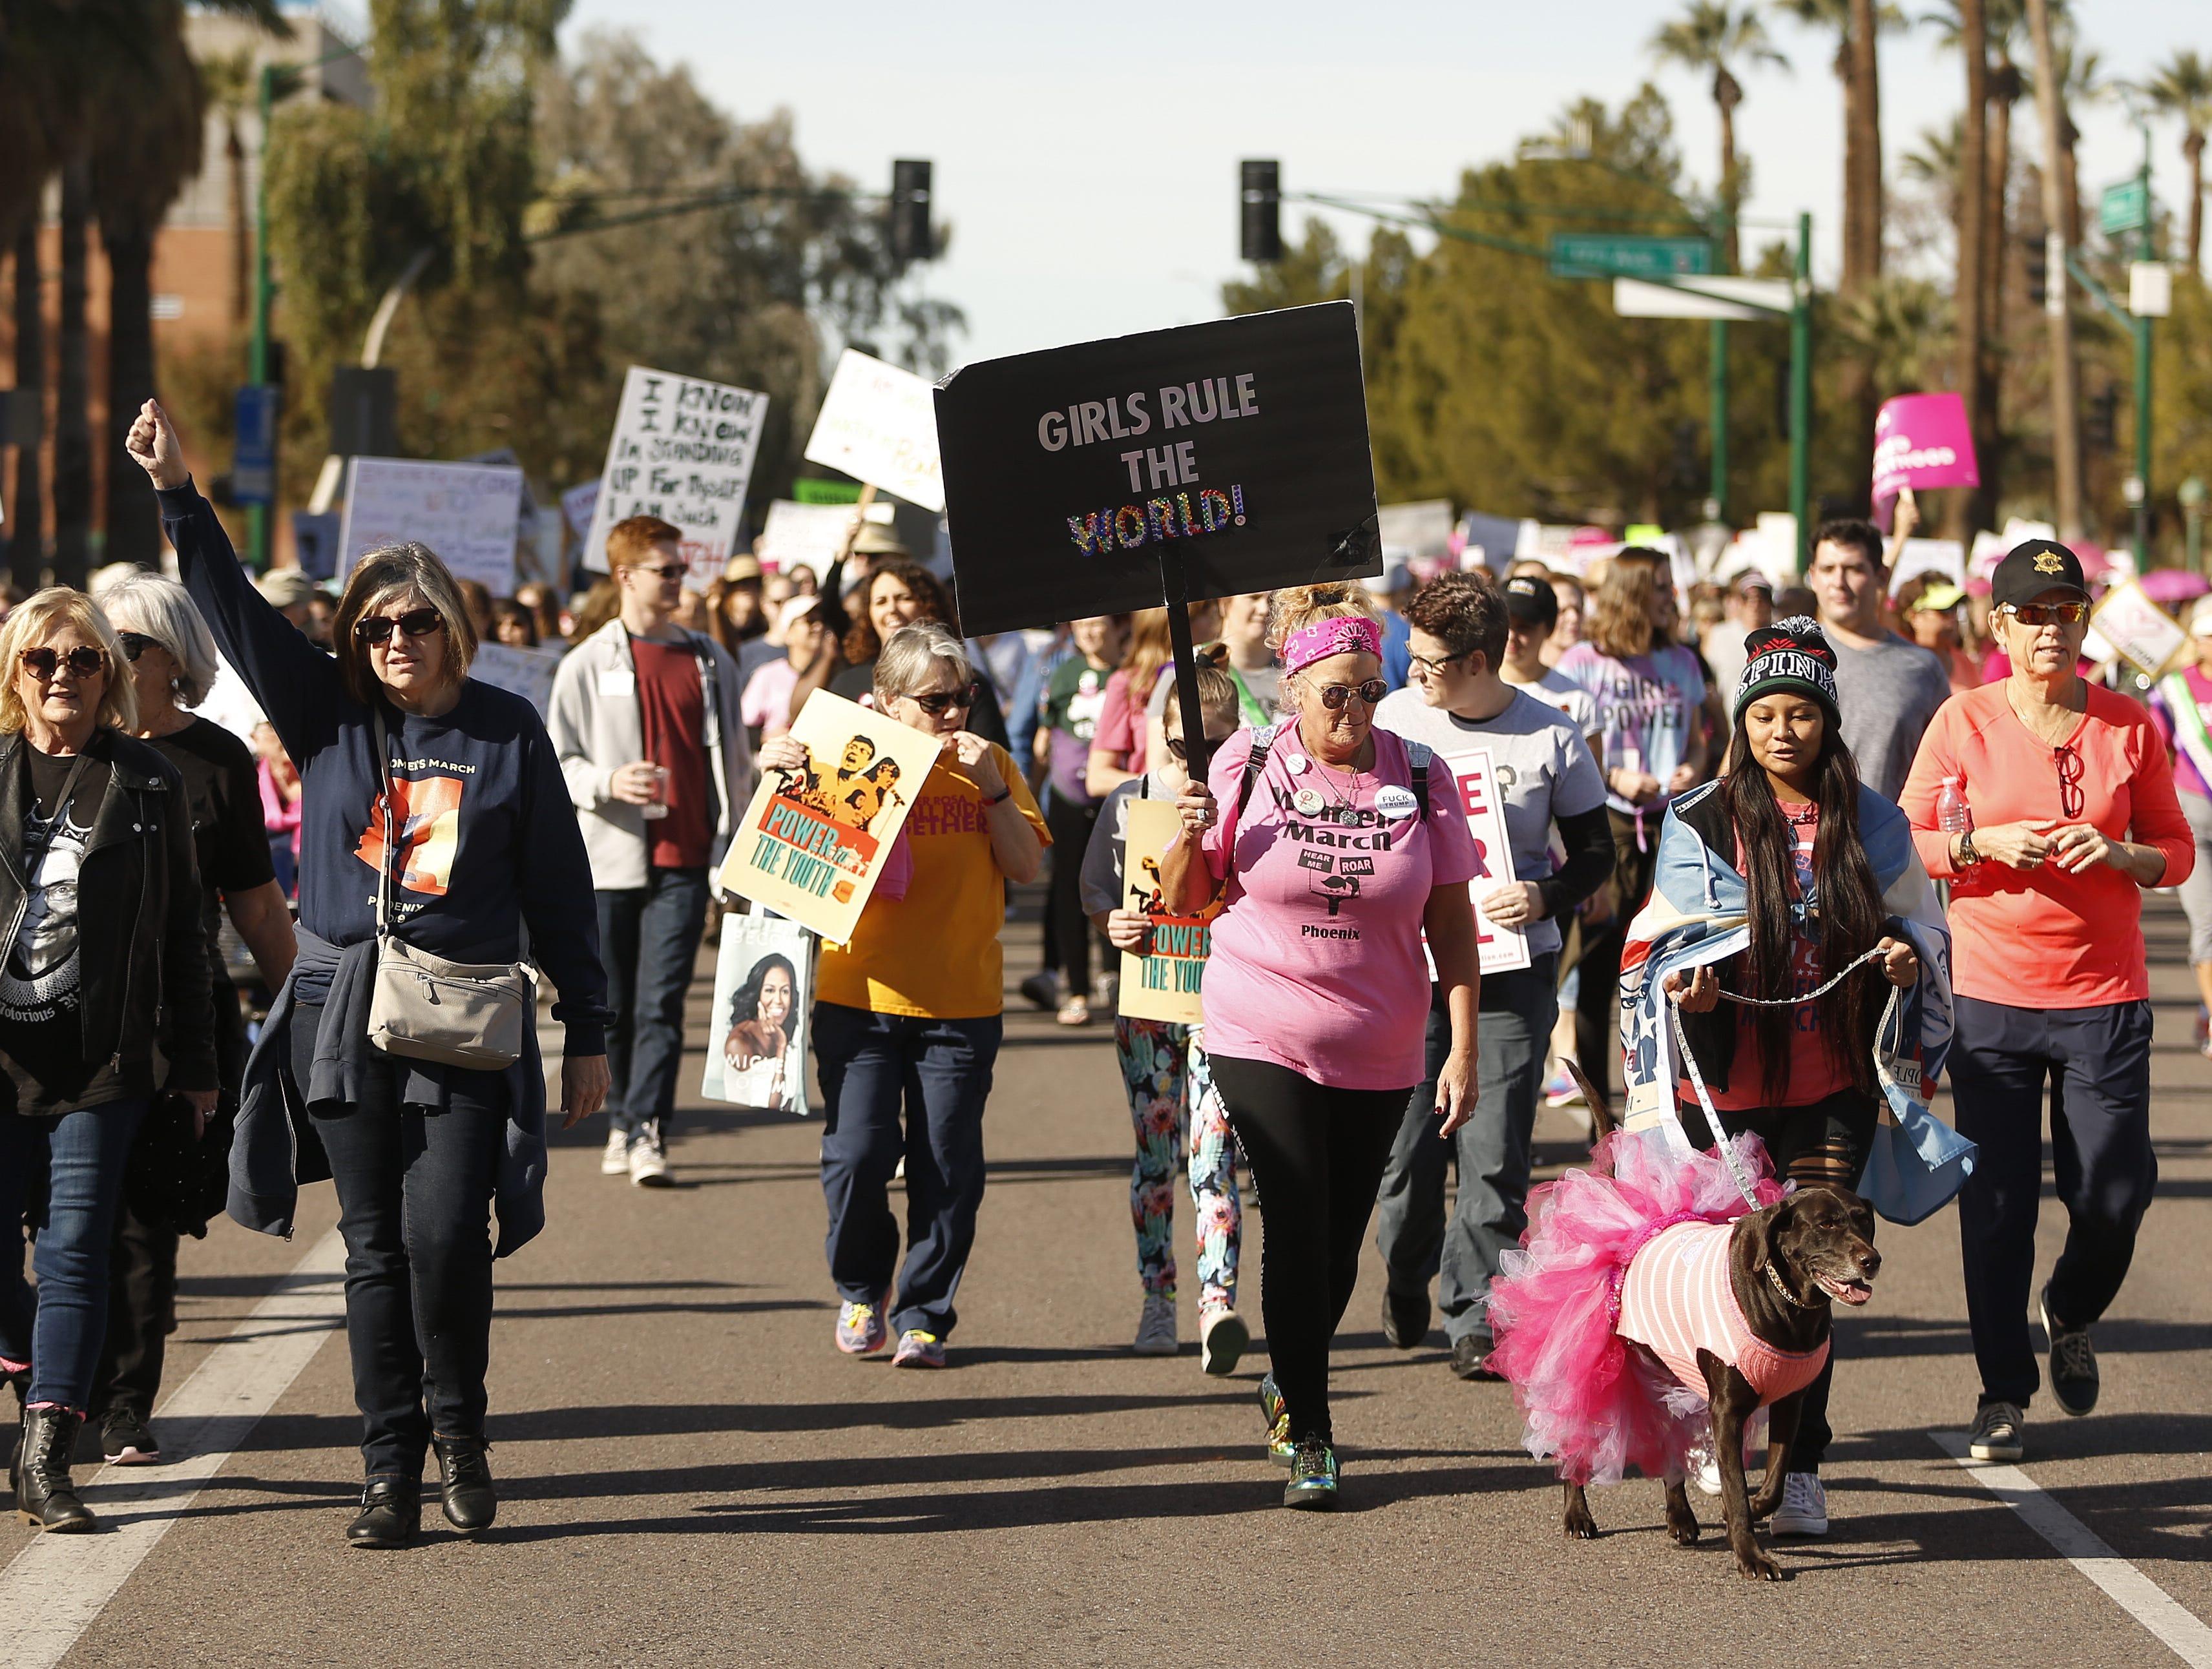 Women take to Jefferson street during the Women's March outside the Arizona Capitol in Phoenix, Jan. 19, 2019.